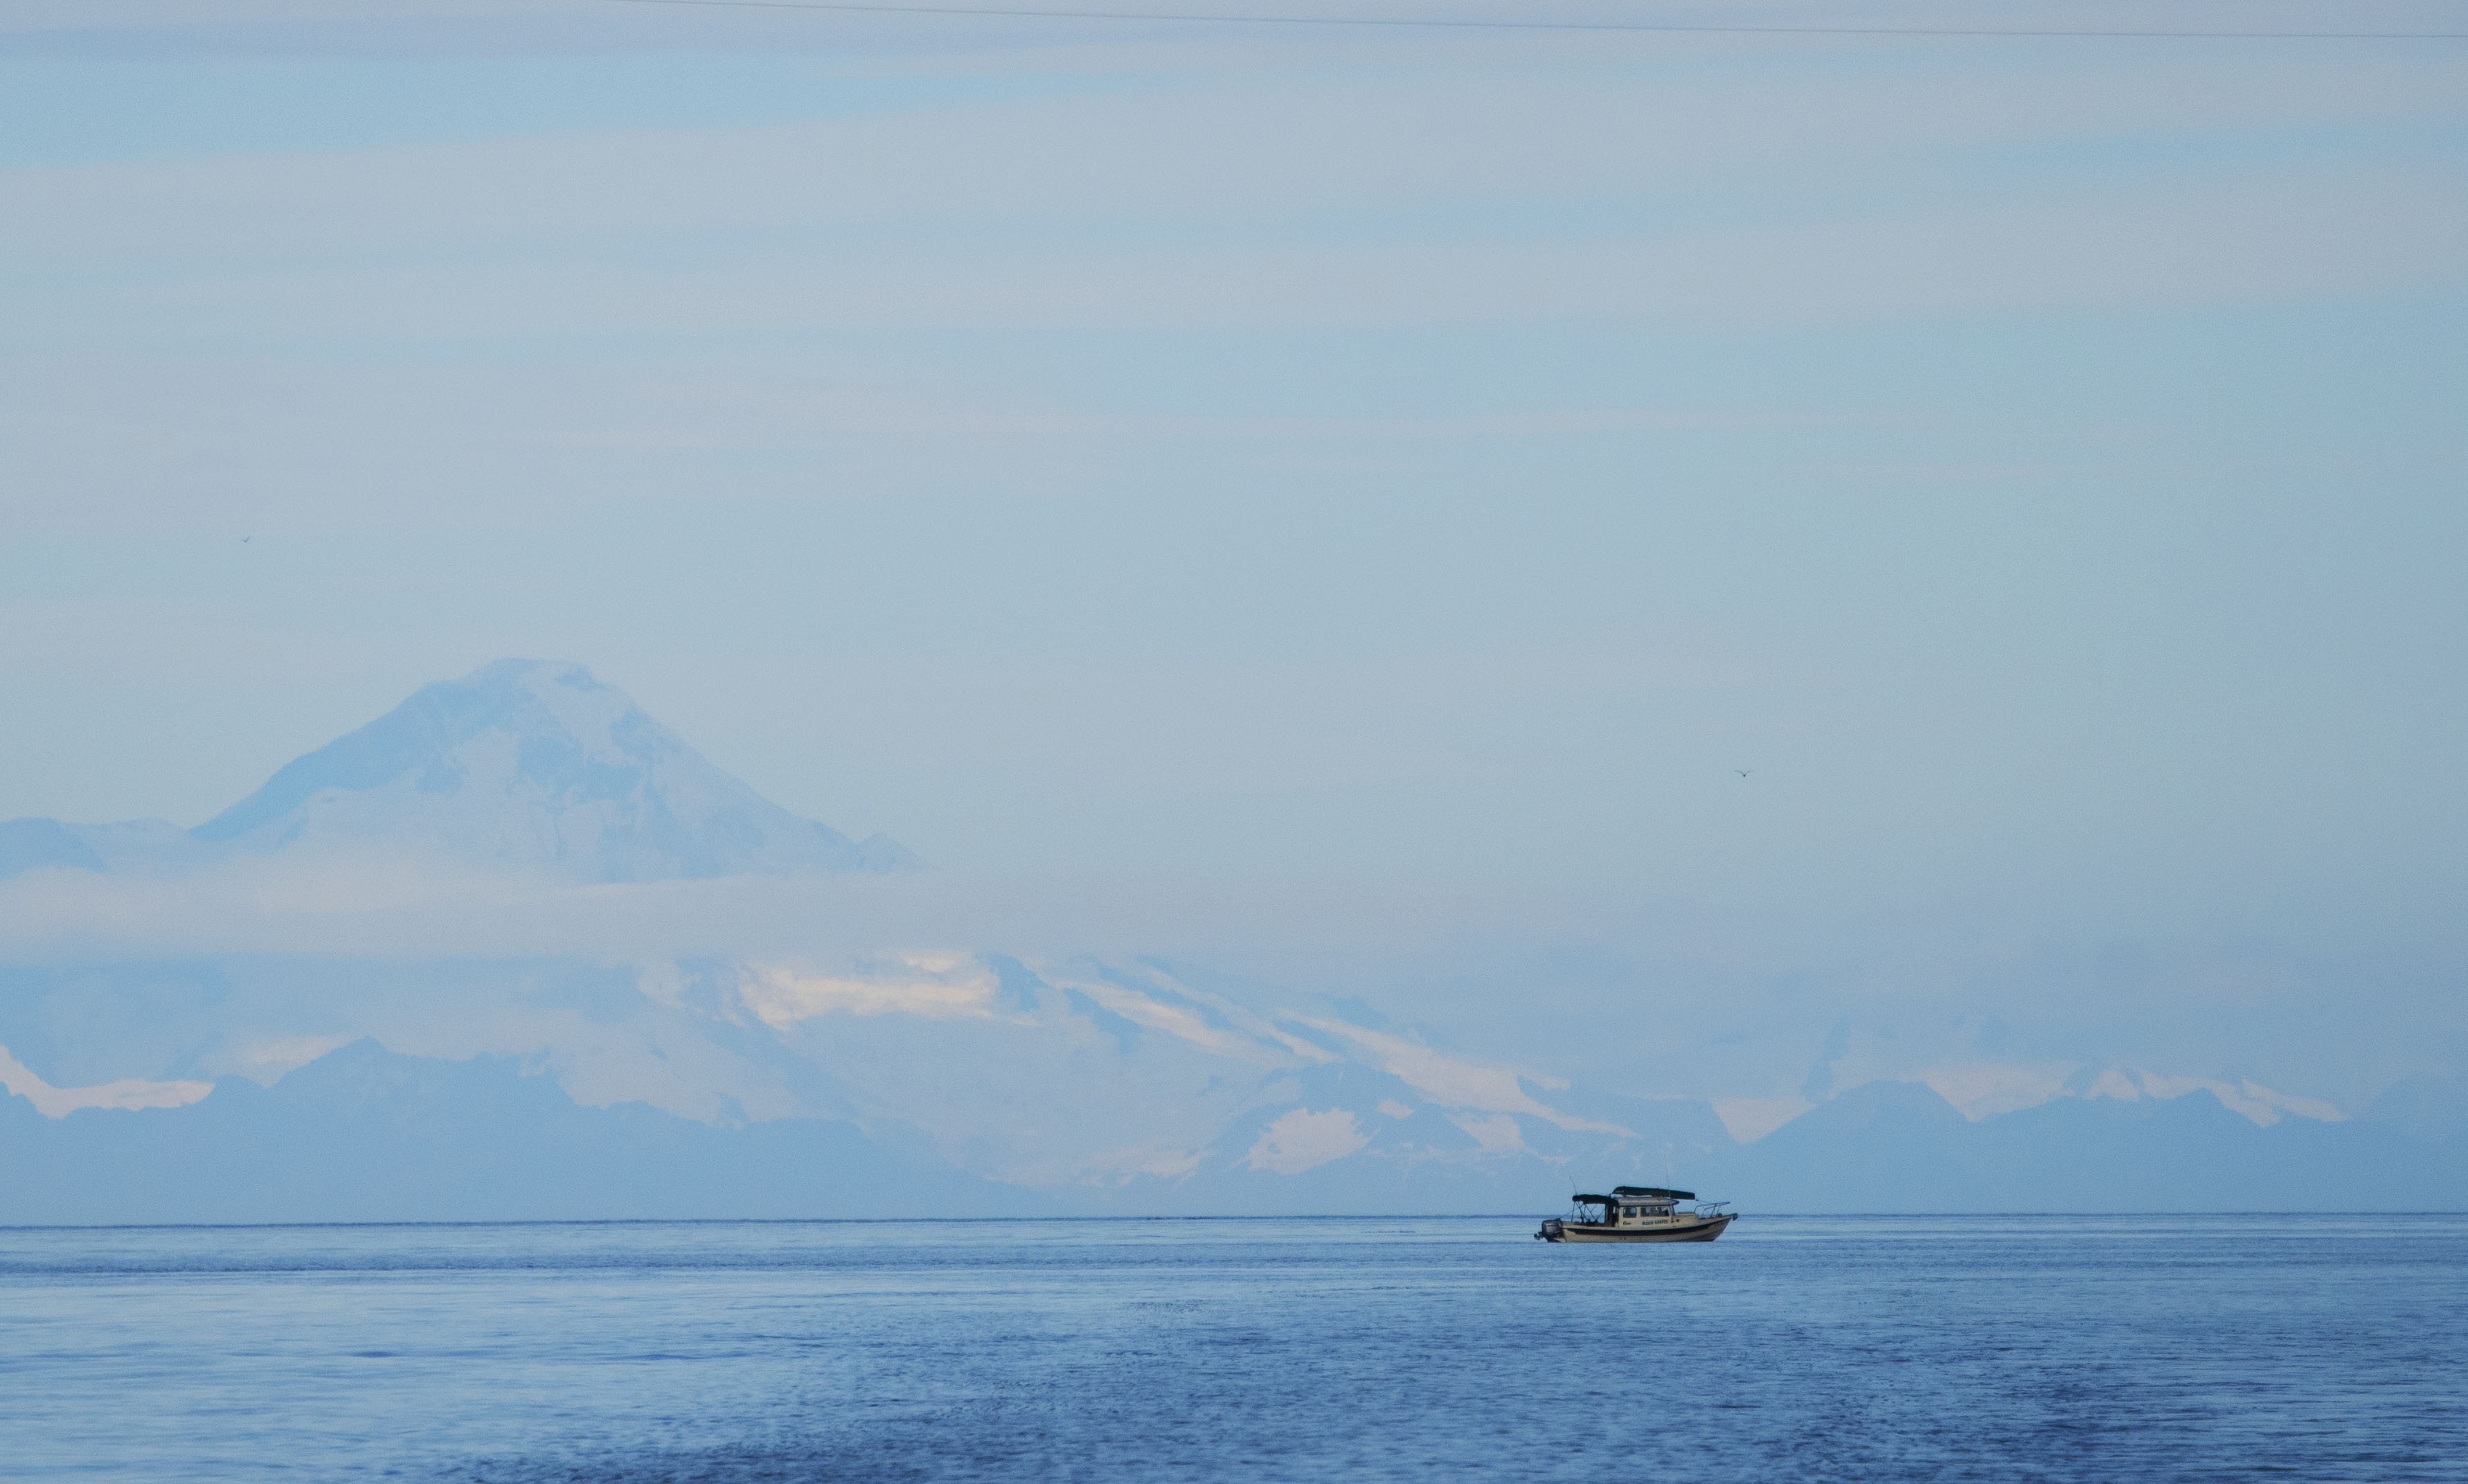 DSC_8094_-_Fishing_Boat_Tutka_Bay_AK_for_Posting